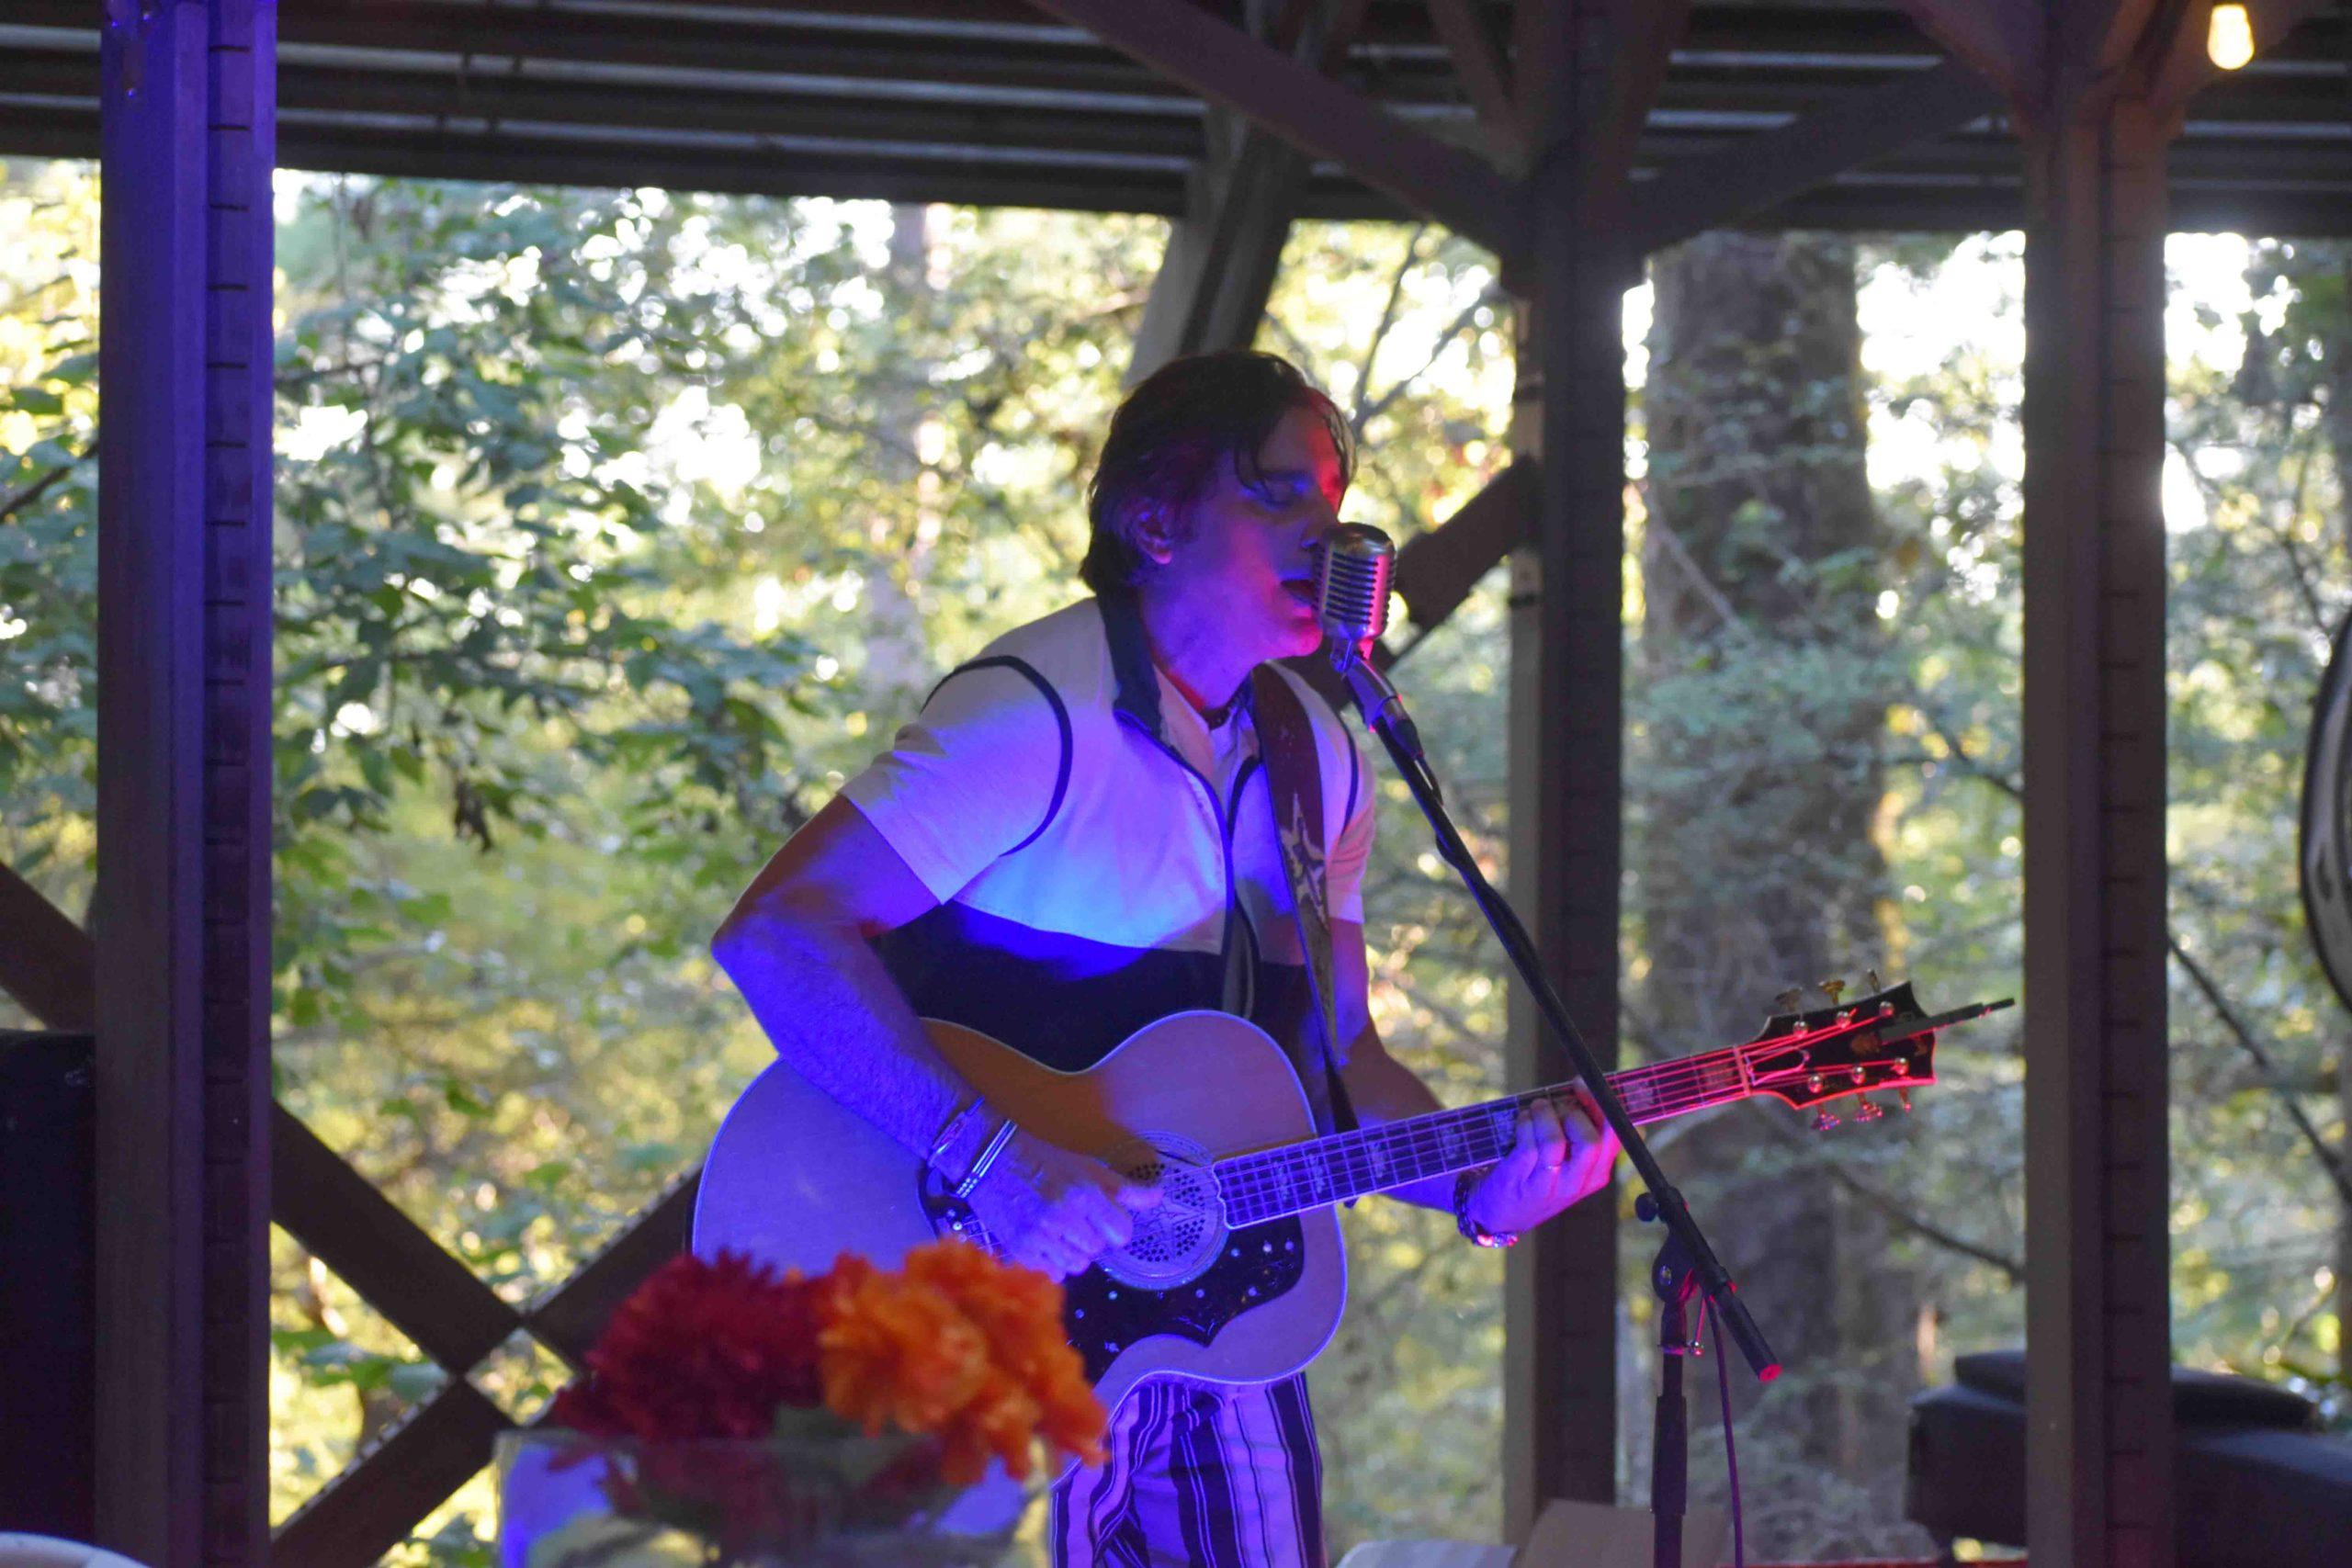 Delta Blues singer, songwriter, Steve Azar performs for the crowd